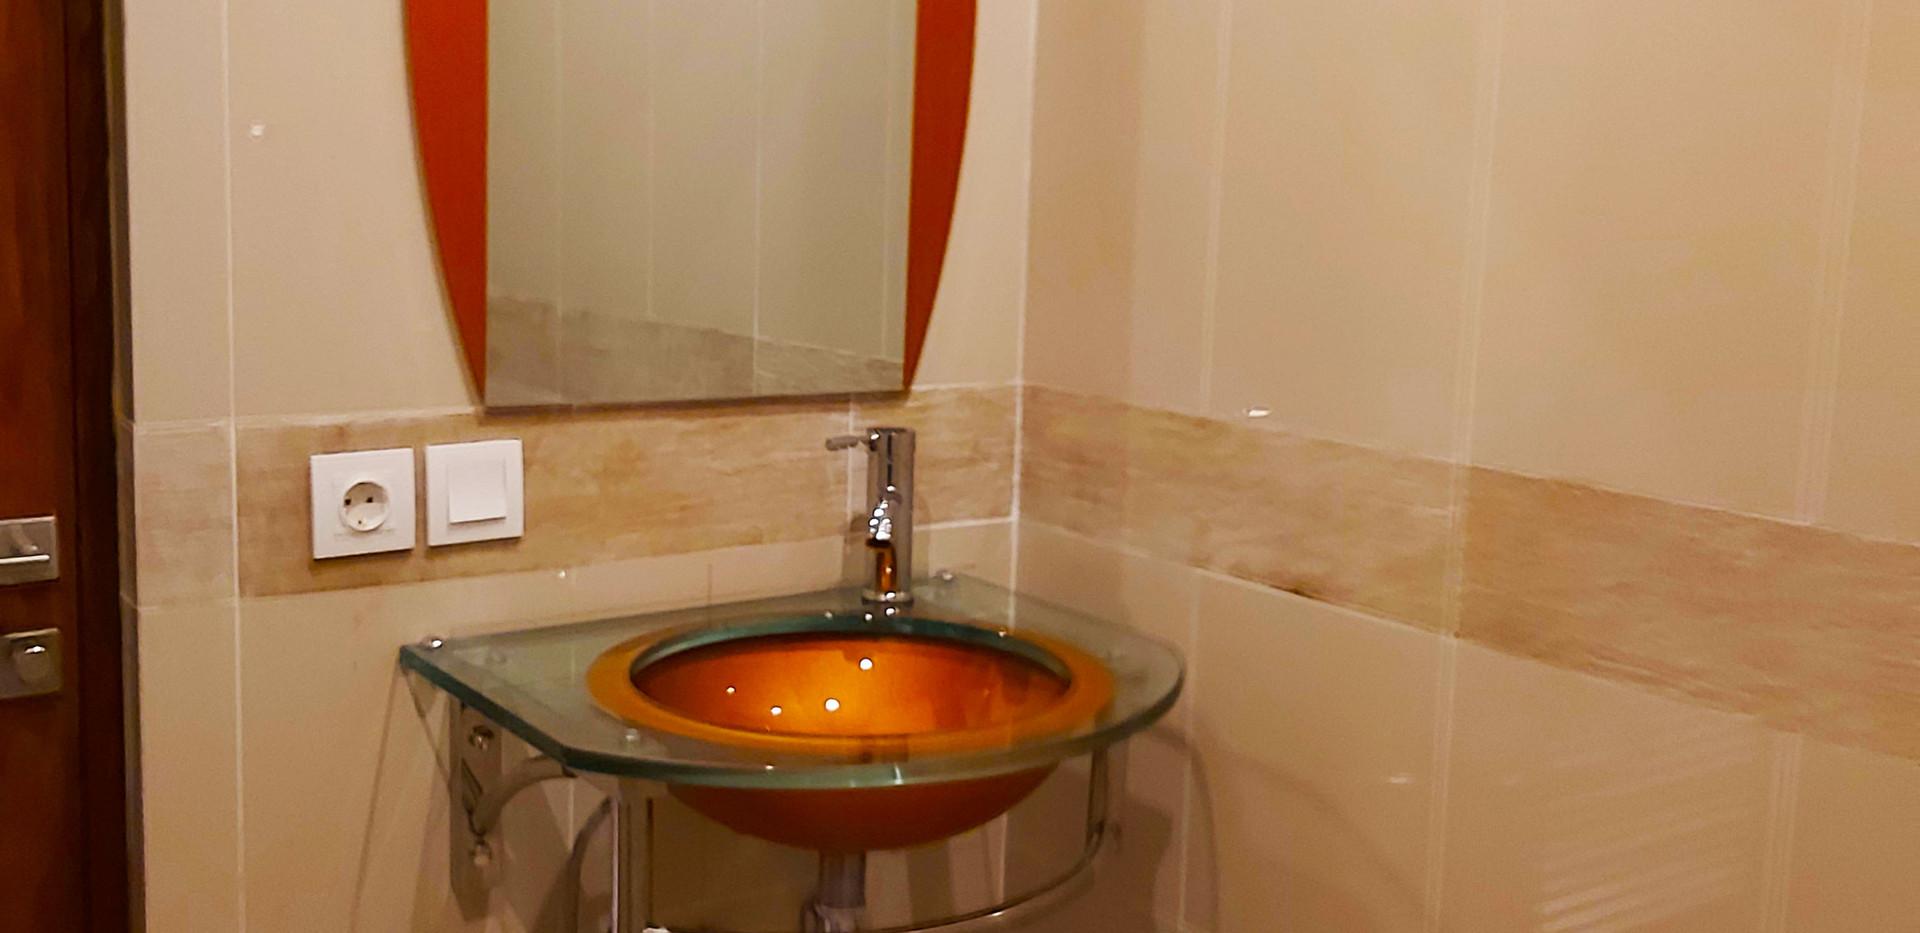 Marina Del Ray Resort Vanity Basin.jpg